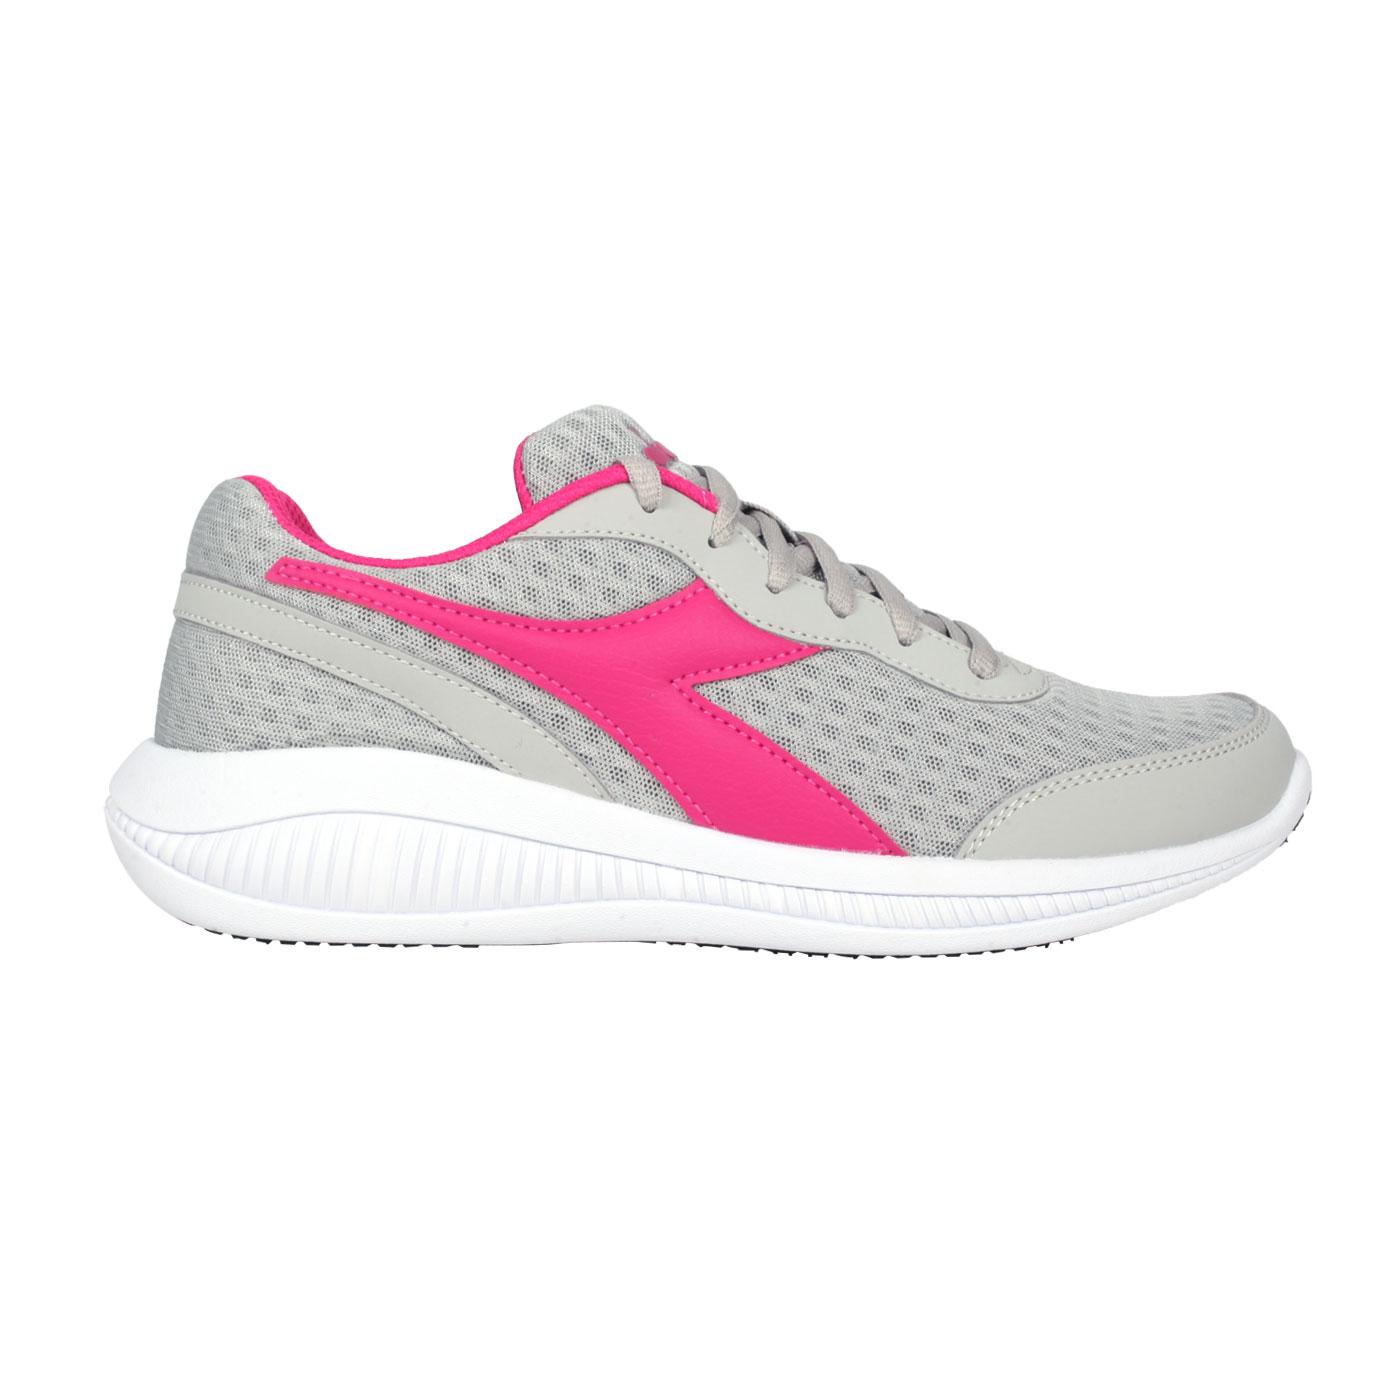 DIADORA 女款原廠進口慢跑鞋 DA176894-C3916 - 灰桃紅